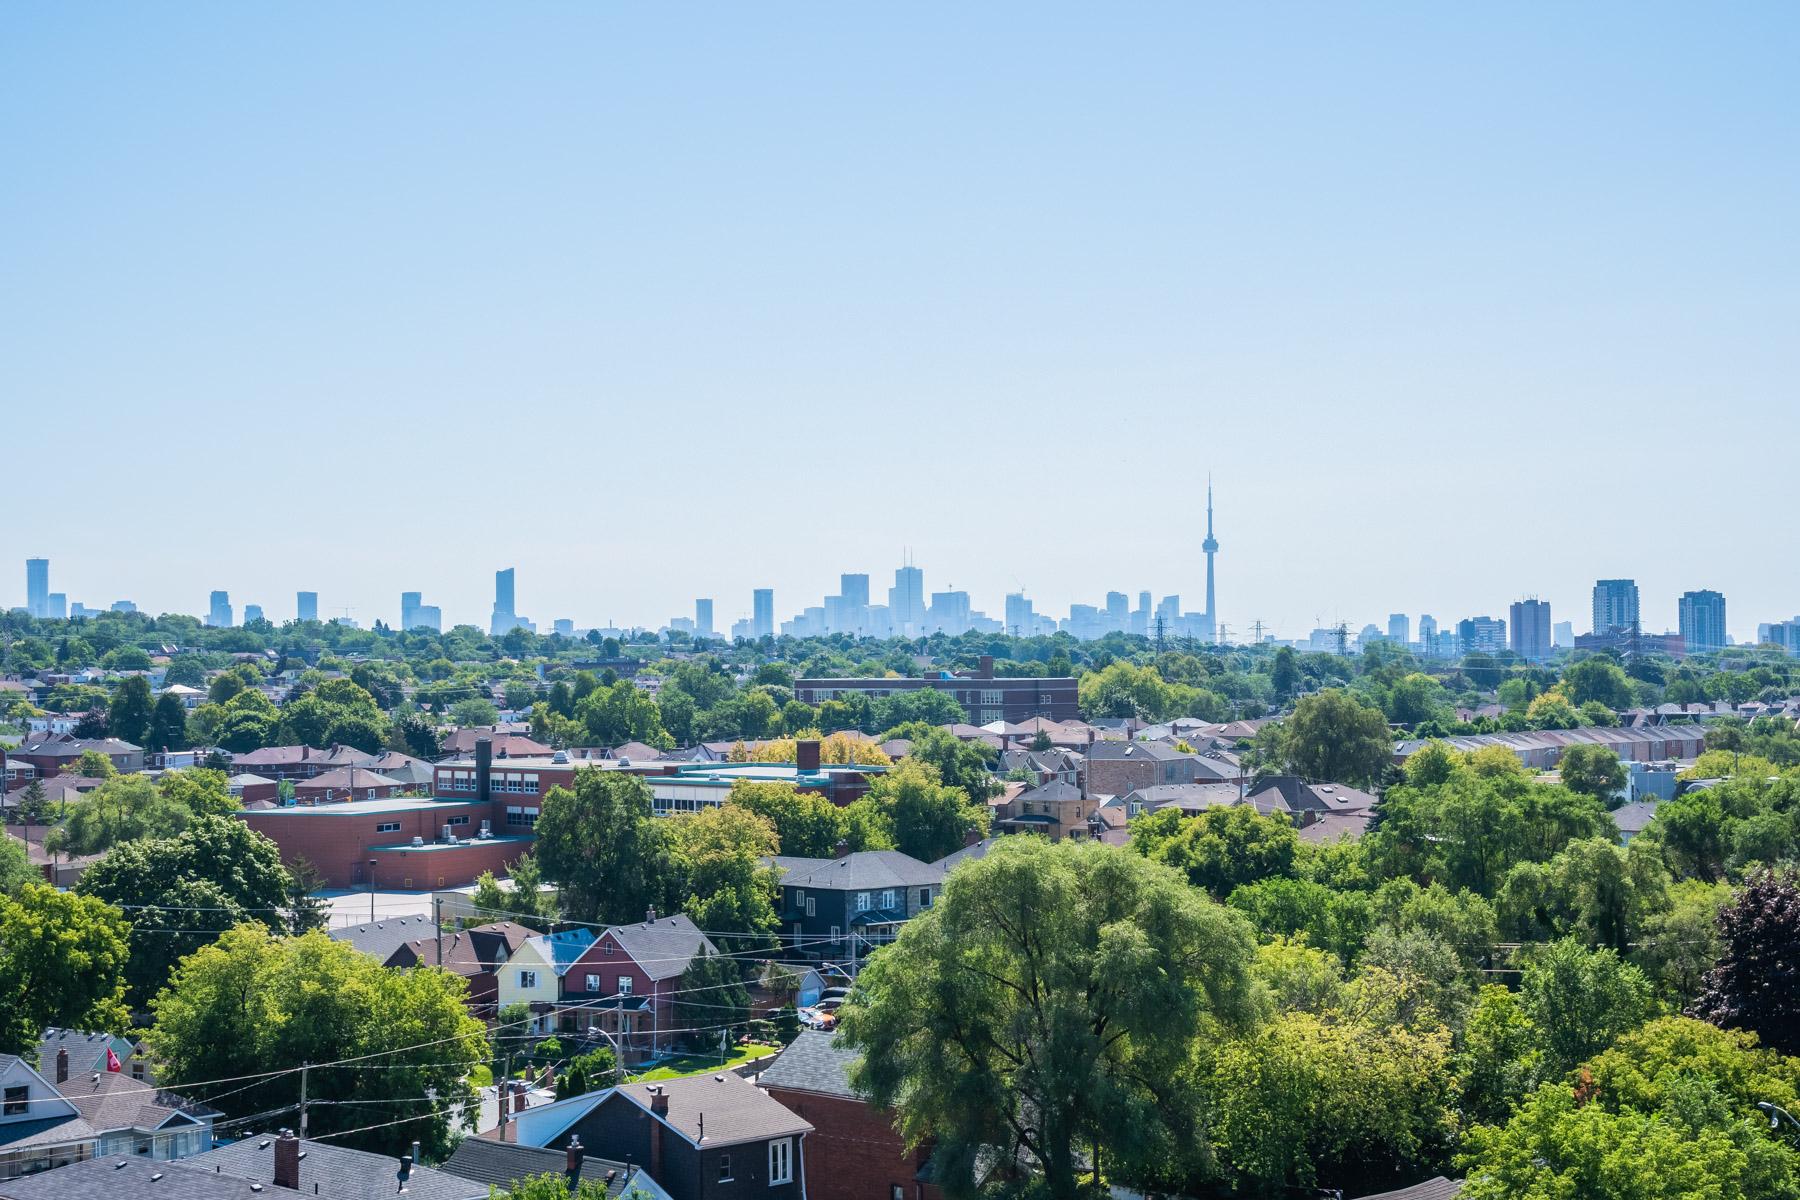 View of Etobicoke Neighbourhoods